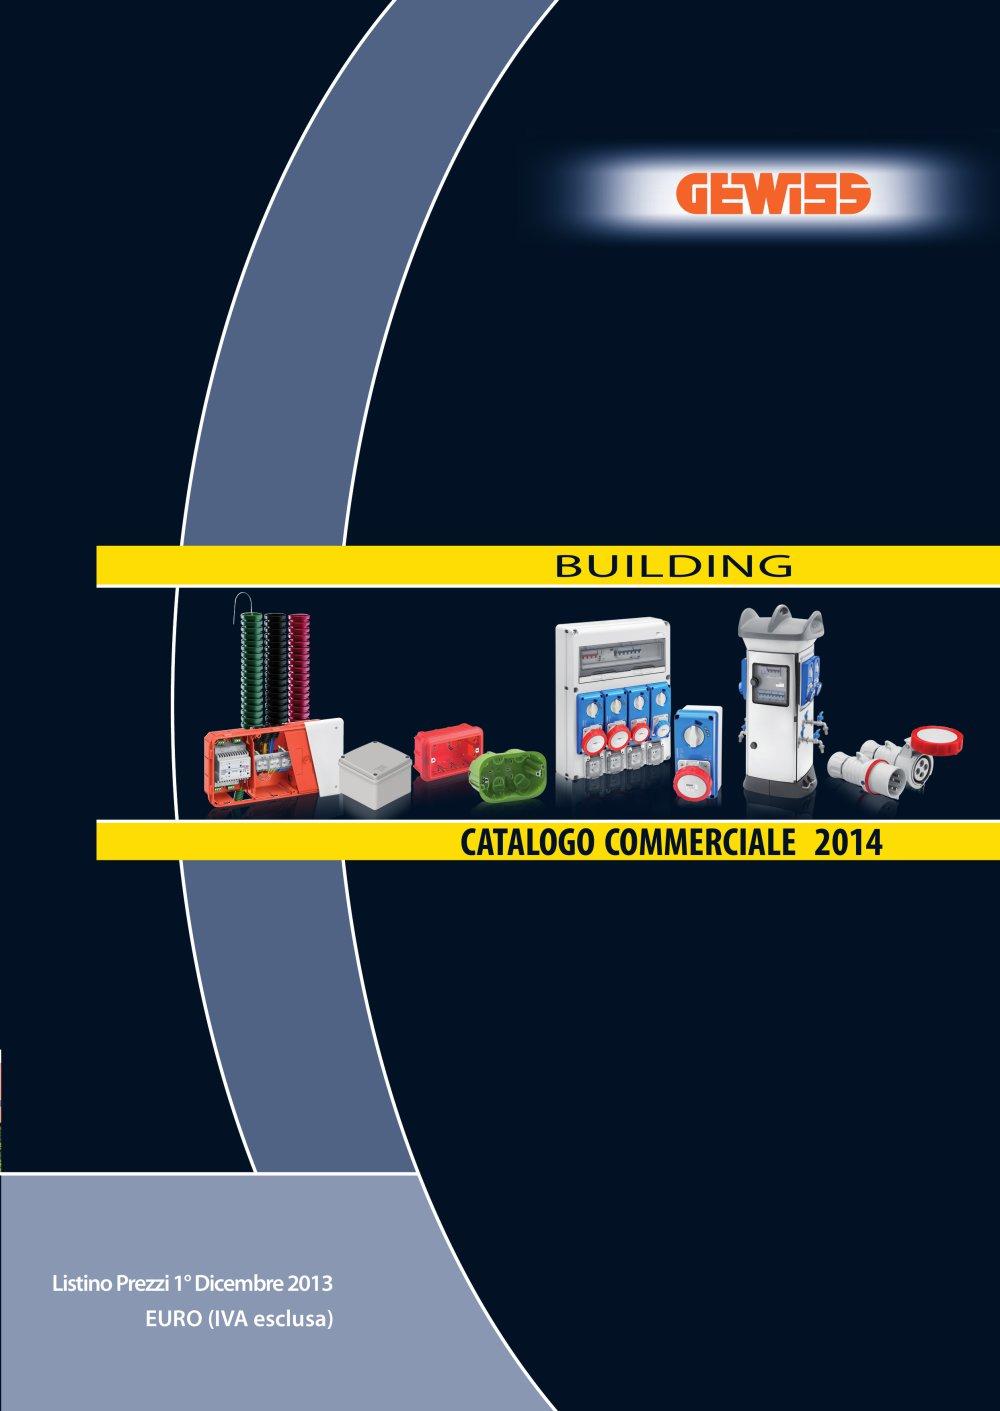 Catalogo Commerciale Building 2014   1 / 657 Pagine